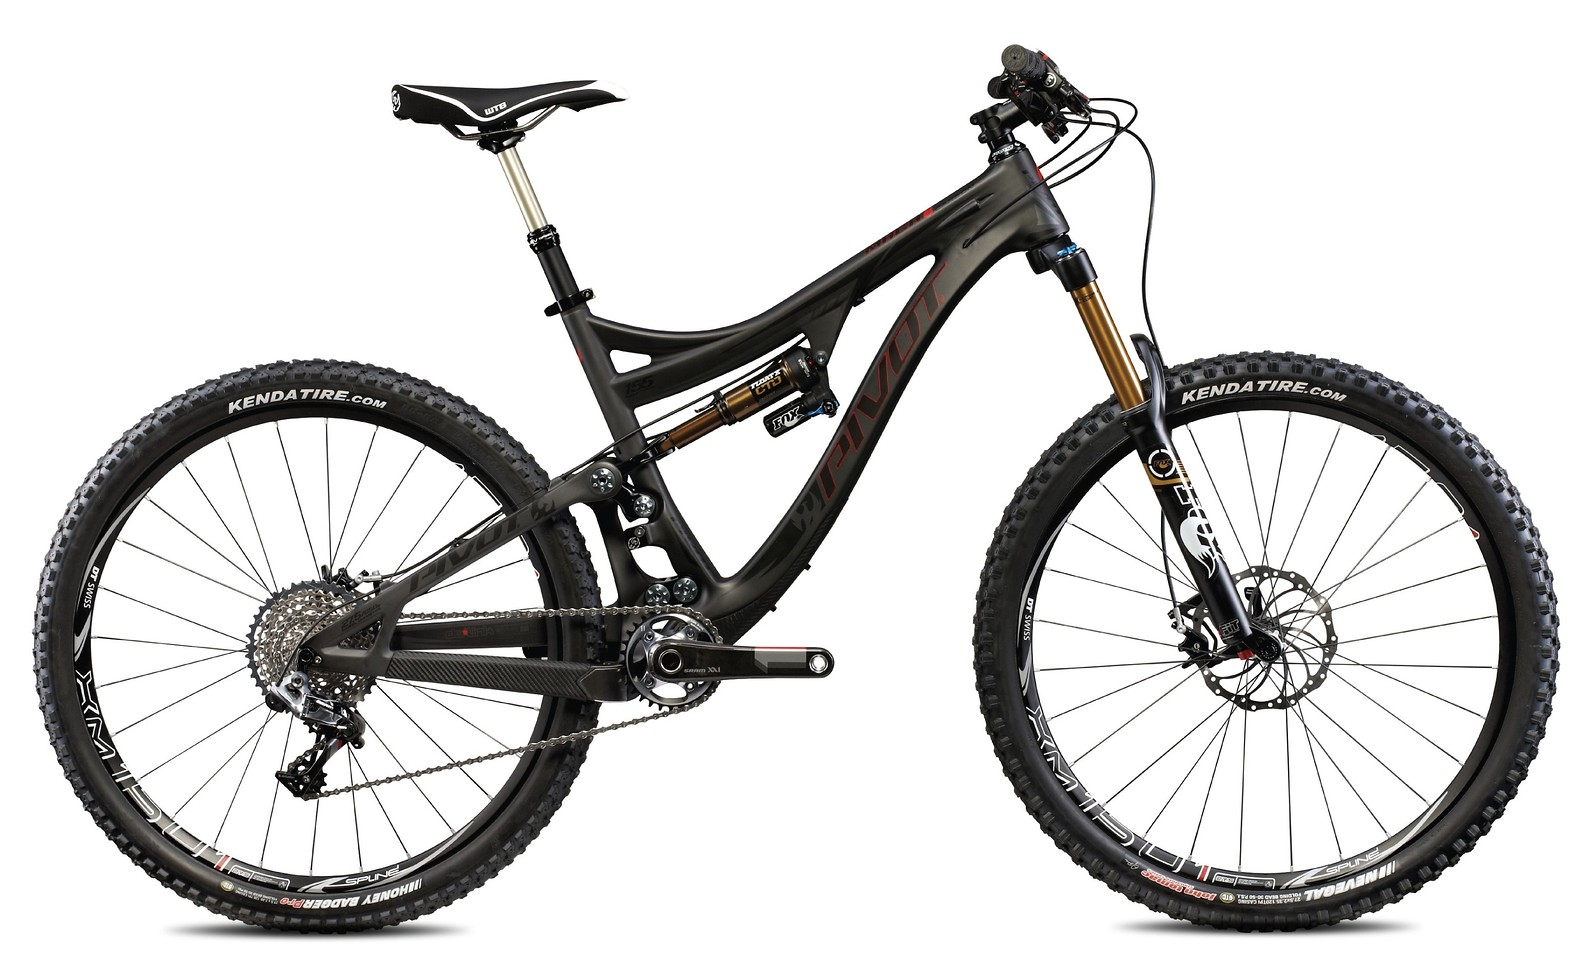 Pivot Mach 6 Carbon Bike - stealth carbon with SRAM XX1 Build